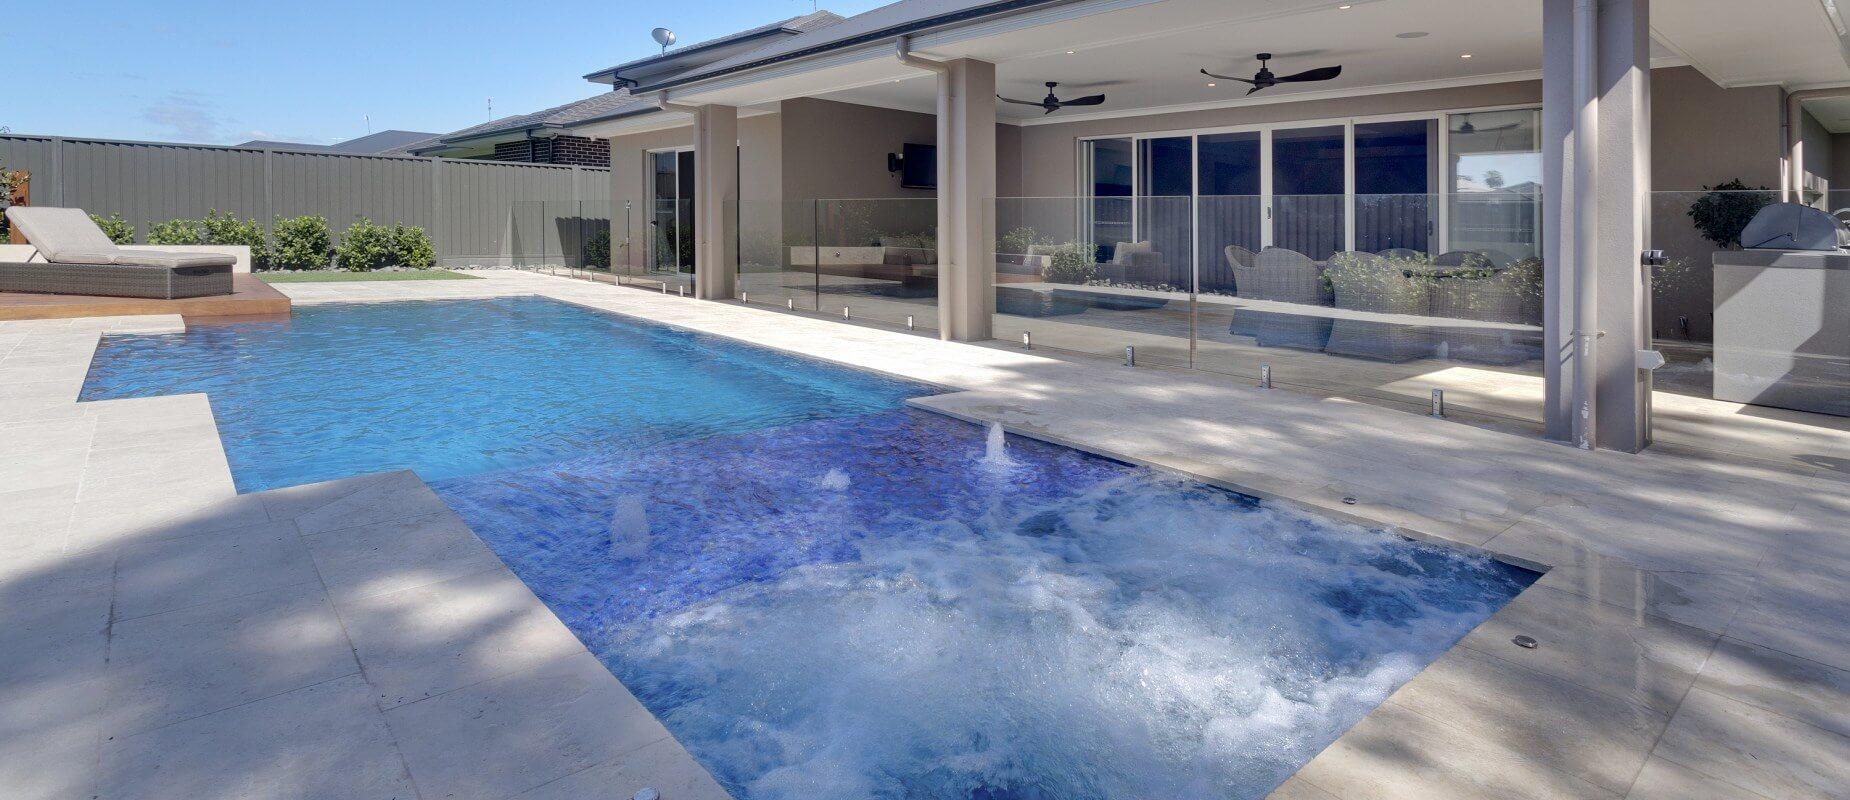 piscina de lux modele frumoase 40